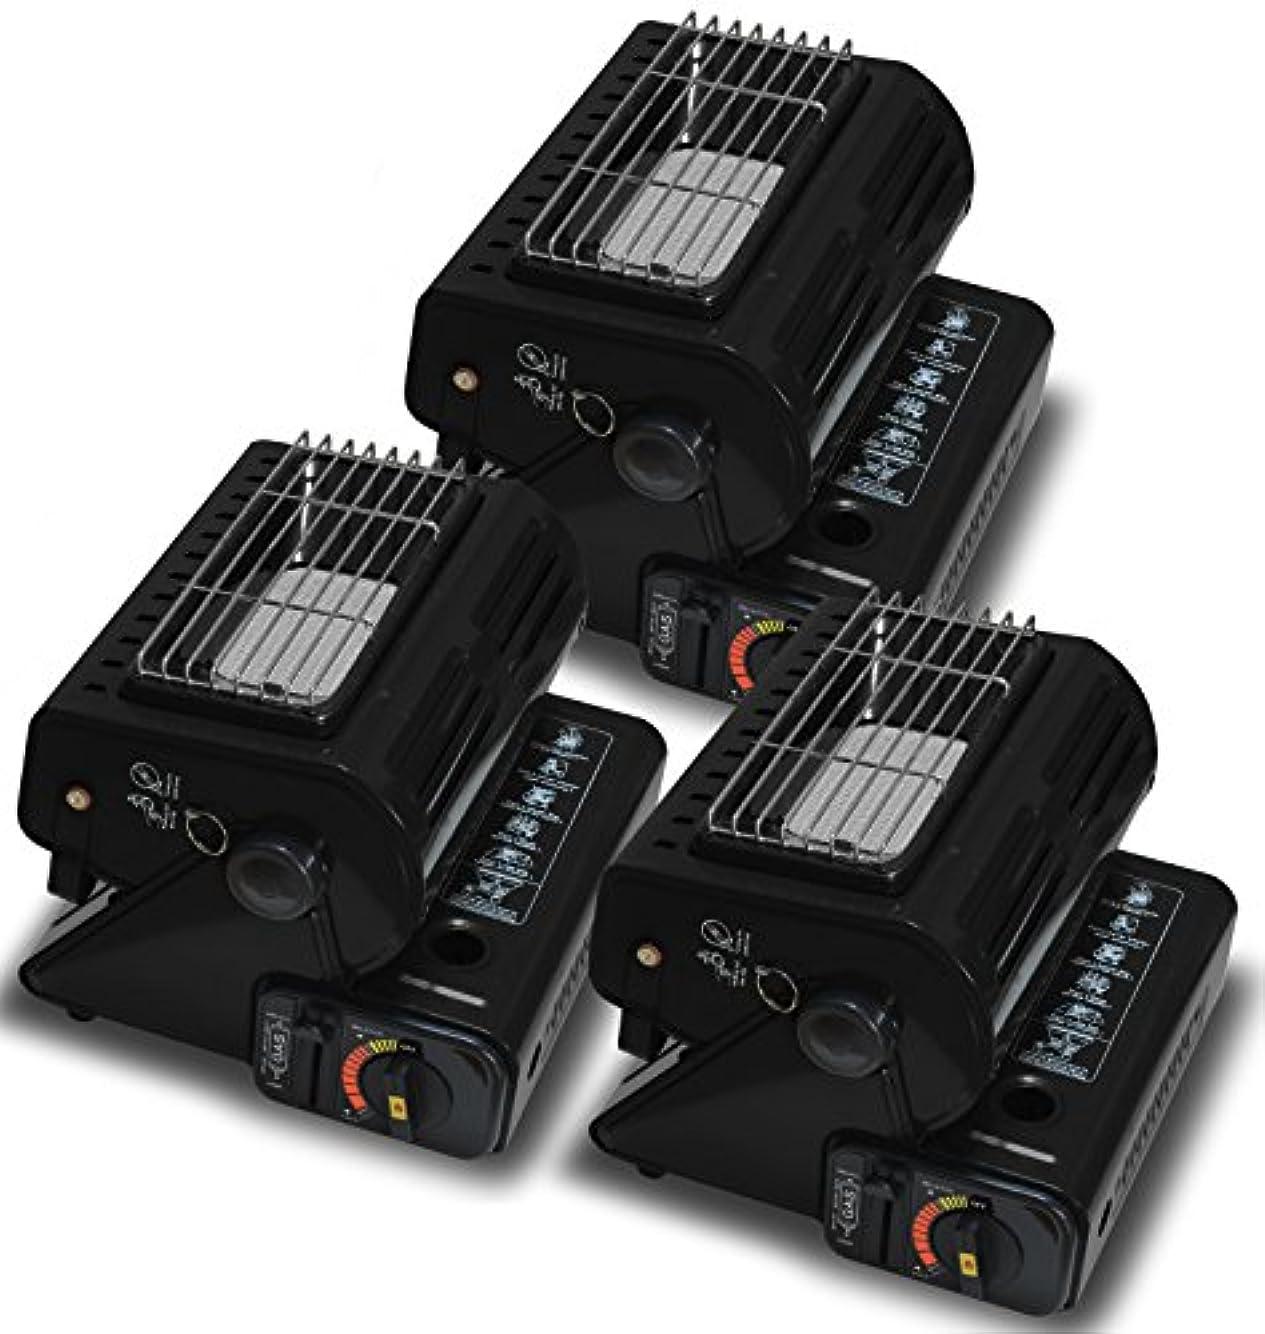 SEIKOH カセットガスストーブ 3個セット A64NBSET3 黒 小型 カセットボンベ式 電源不要 上向き可能